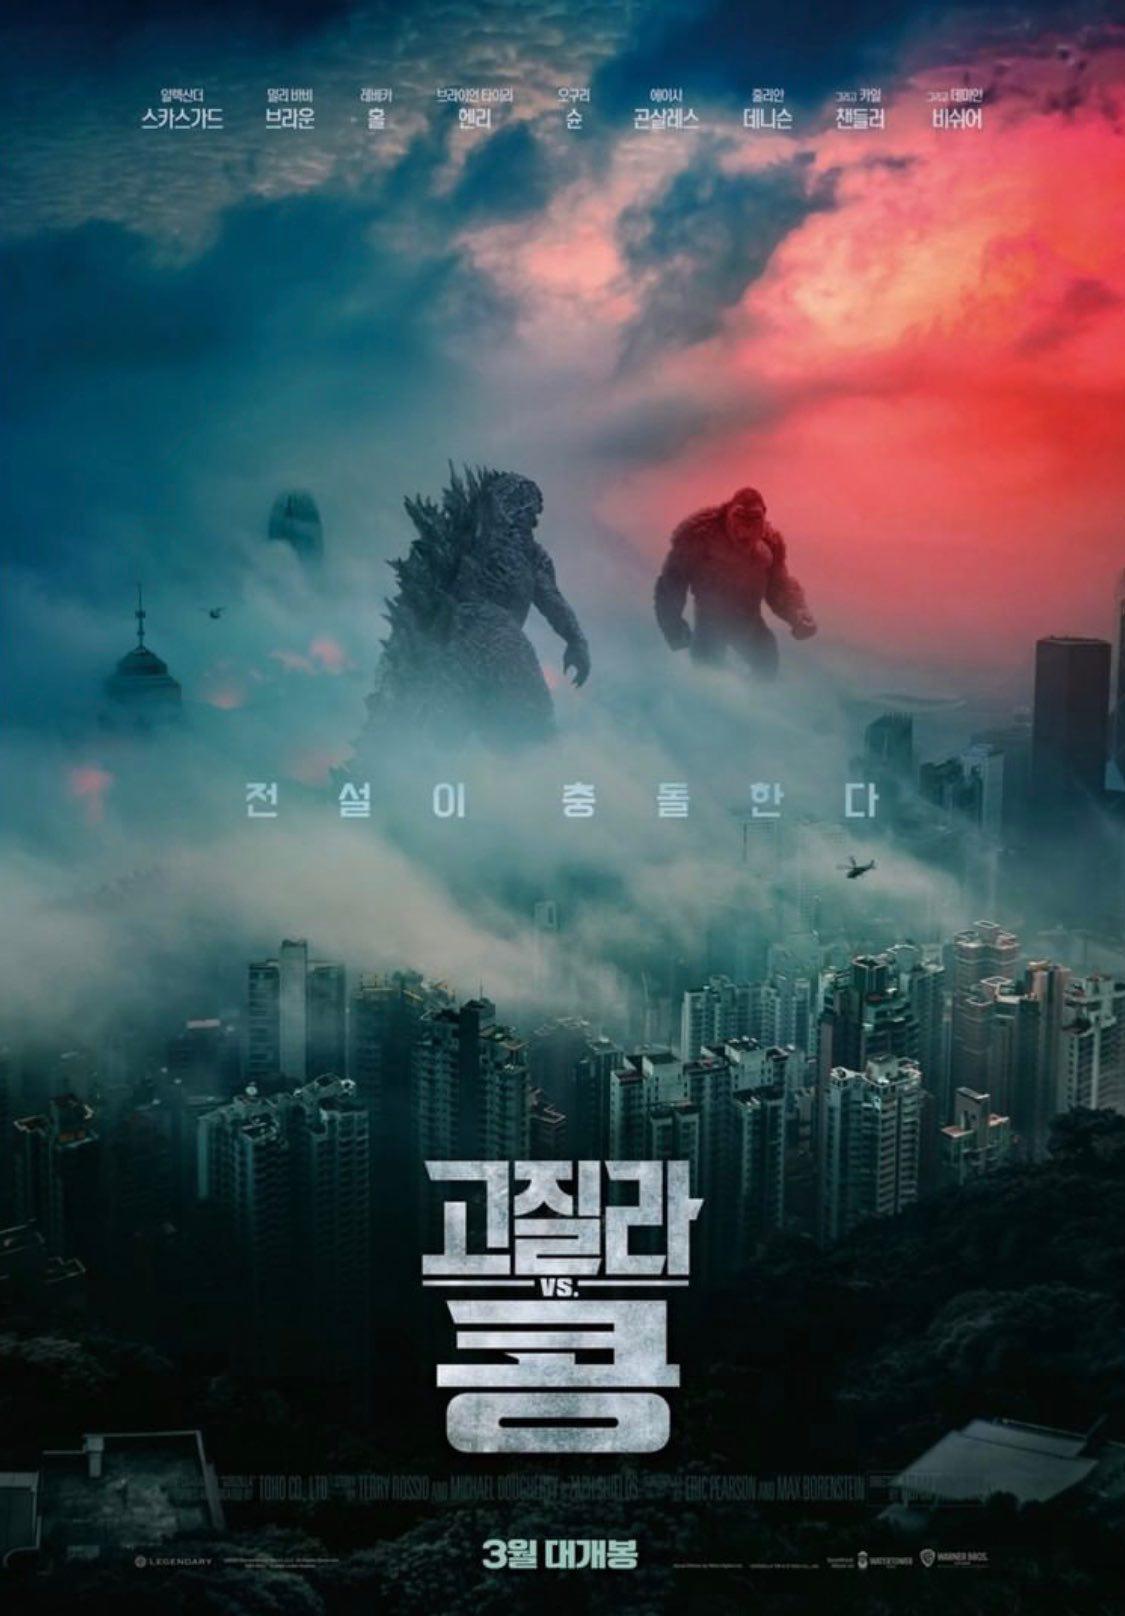 Godzilla vs Kong: Pôster internacional